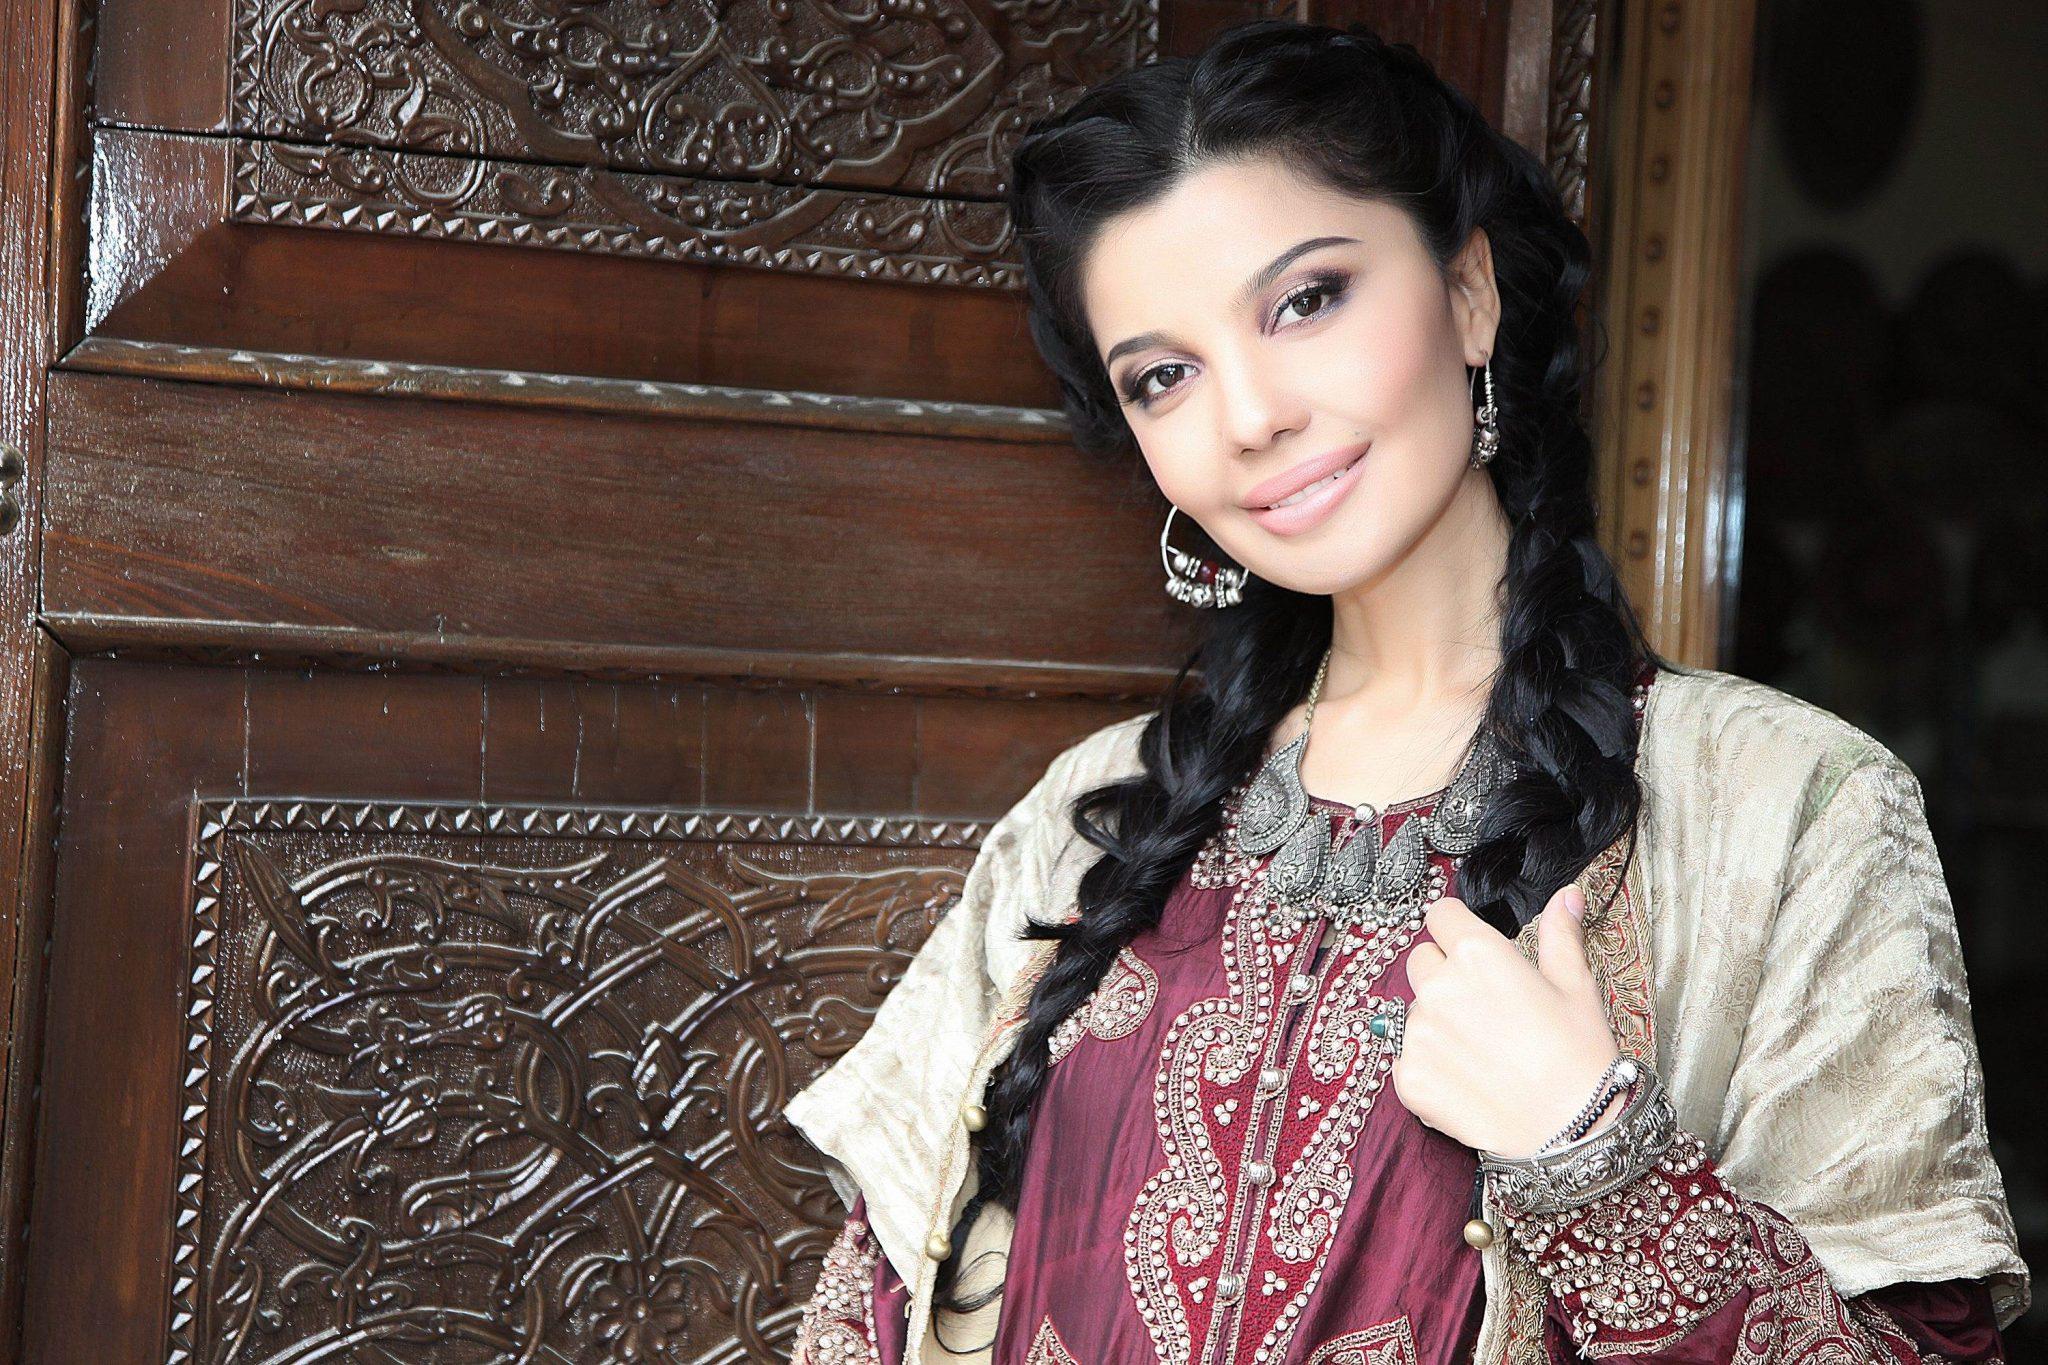 тао фото узбекских актрис процесс полностью